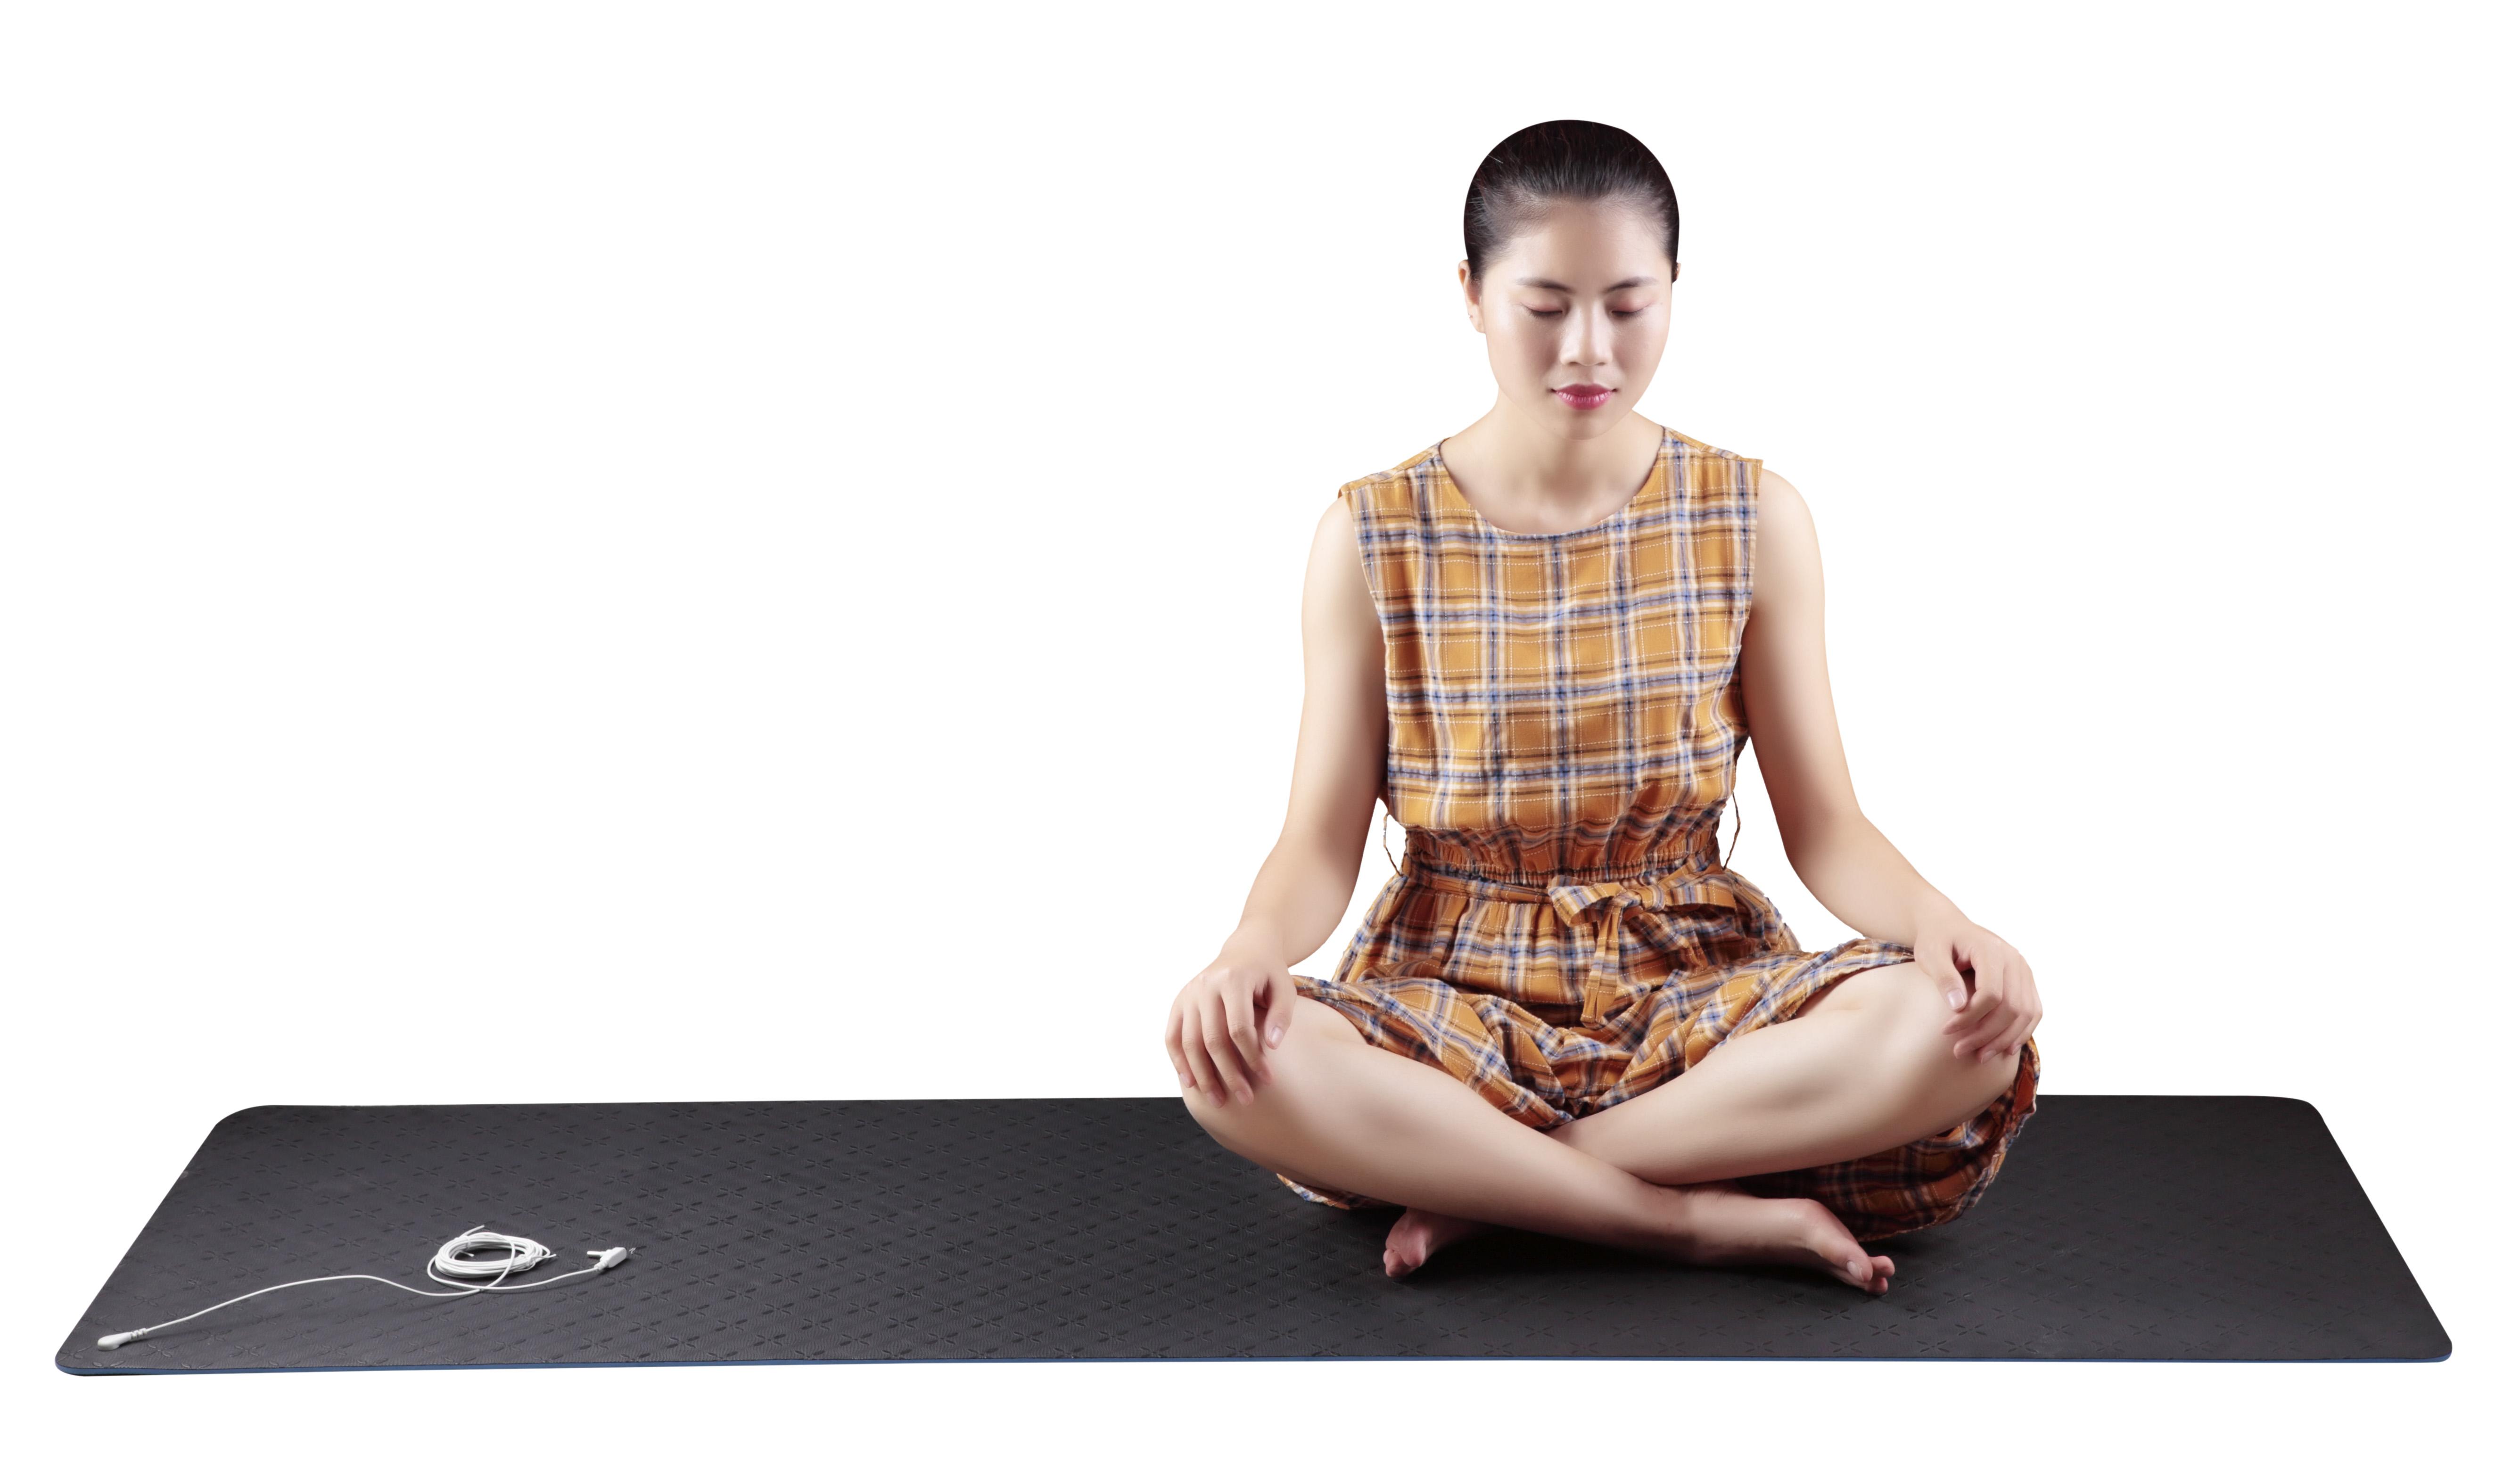 Maxsharer eco friendly blue conductive yoga mat